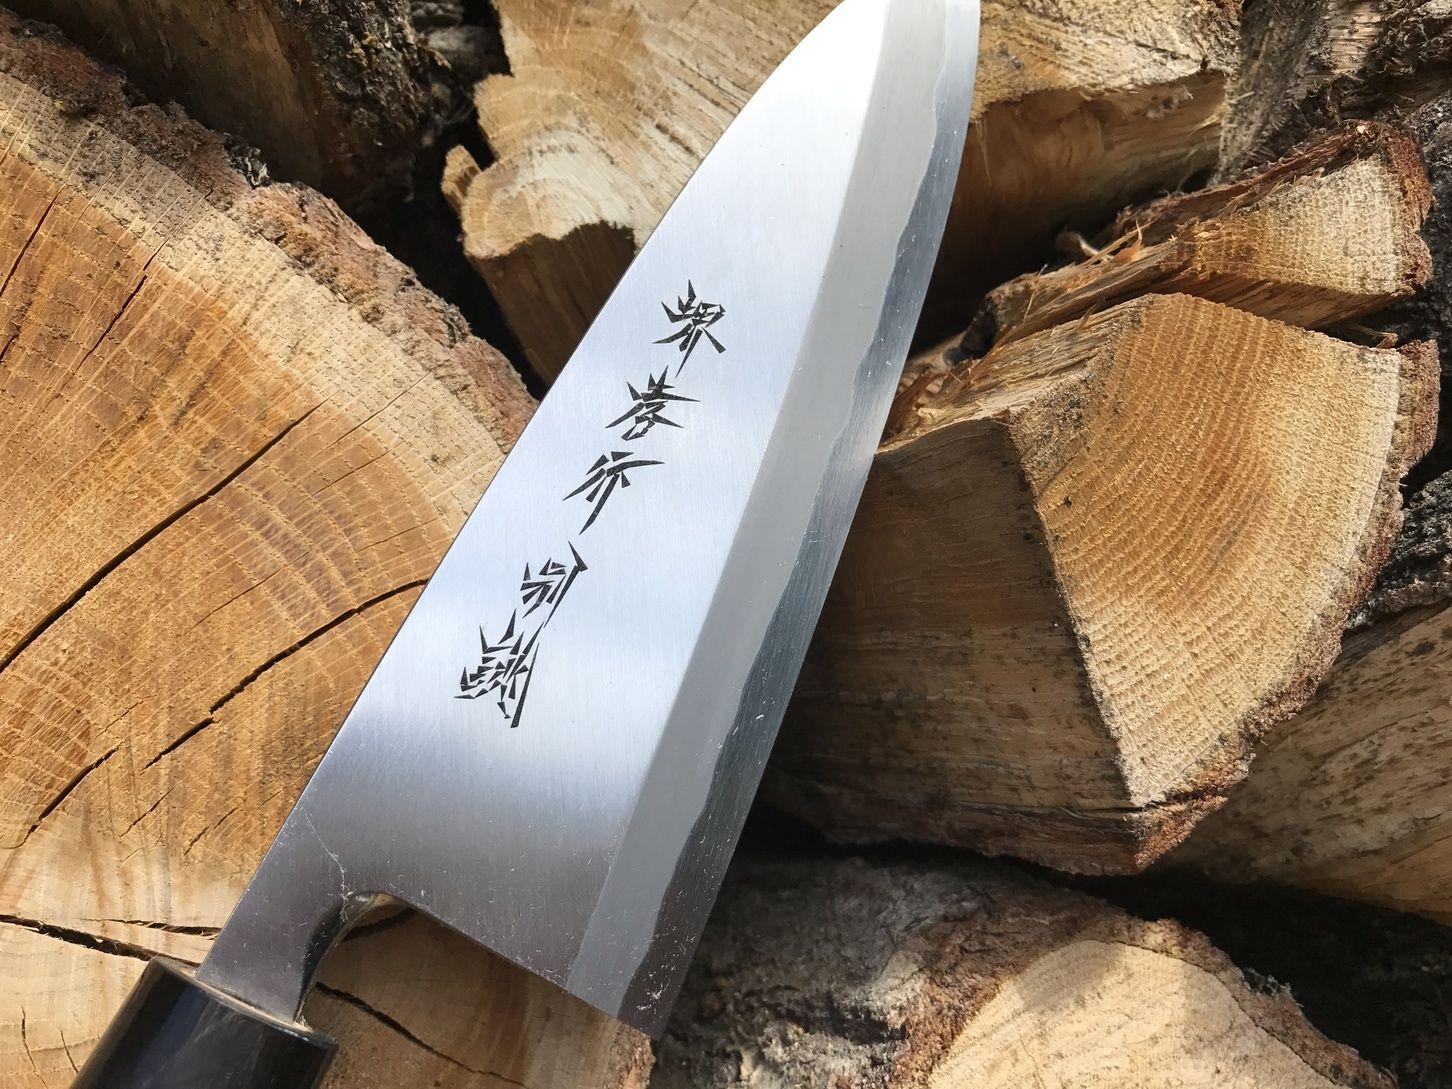 Can You Read Kanji On This Beautiful Deba Hocho Japanese Kitchen Knives Butcher Gyuto Suji Japanese Cooking Knives Cooking Chicken Thighs Cooking Meme